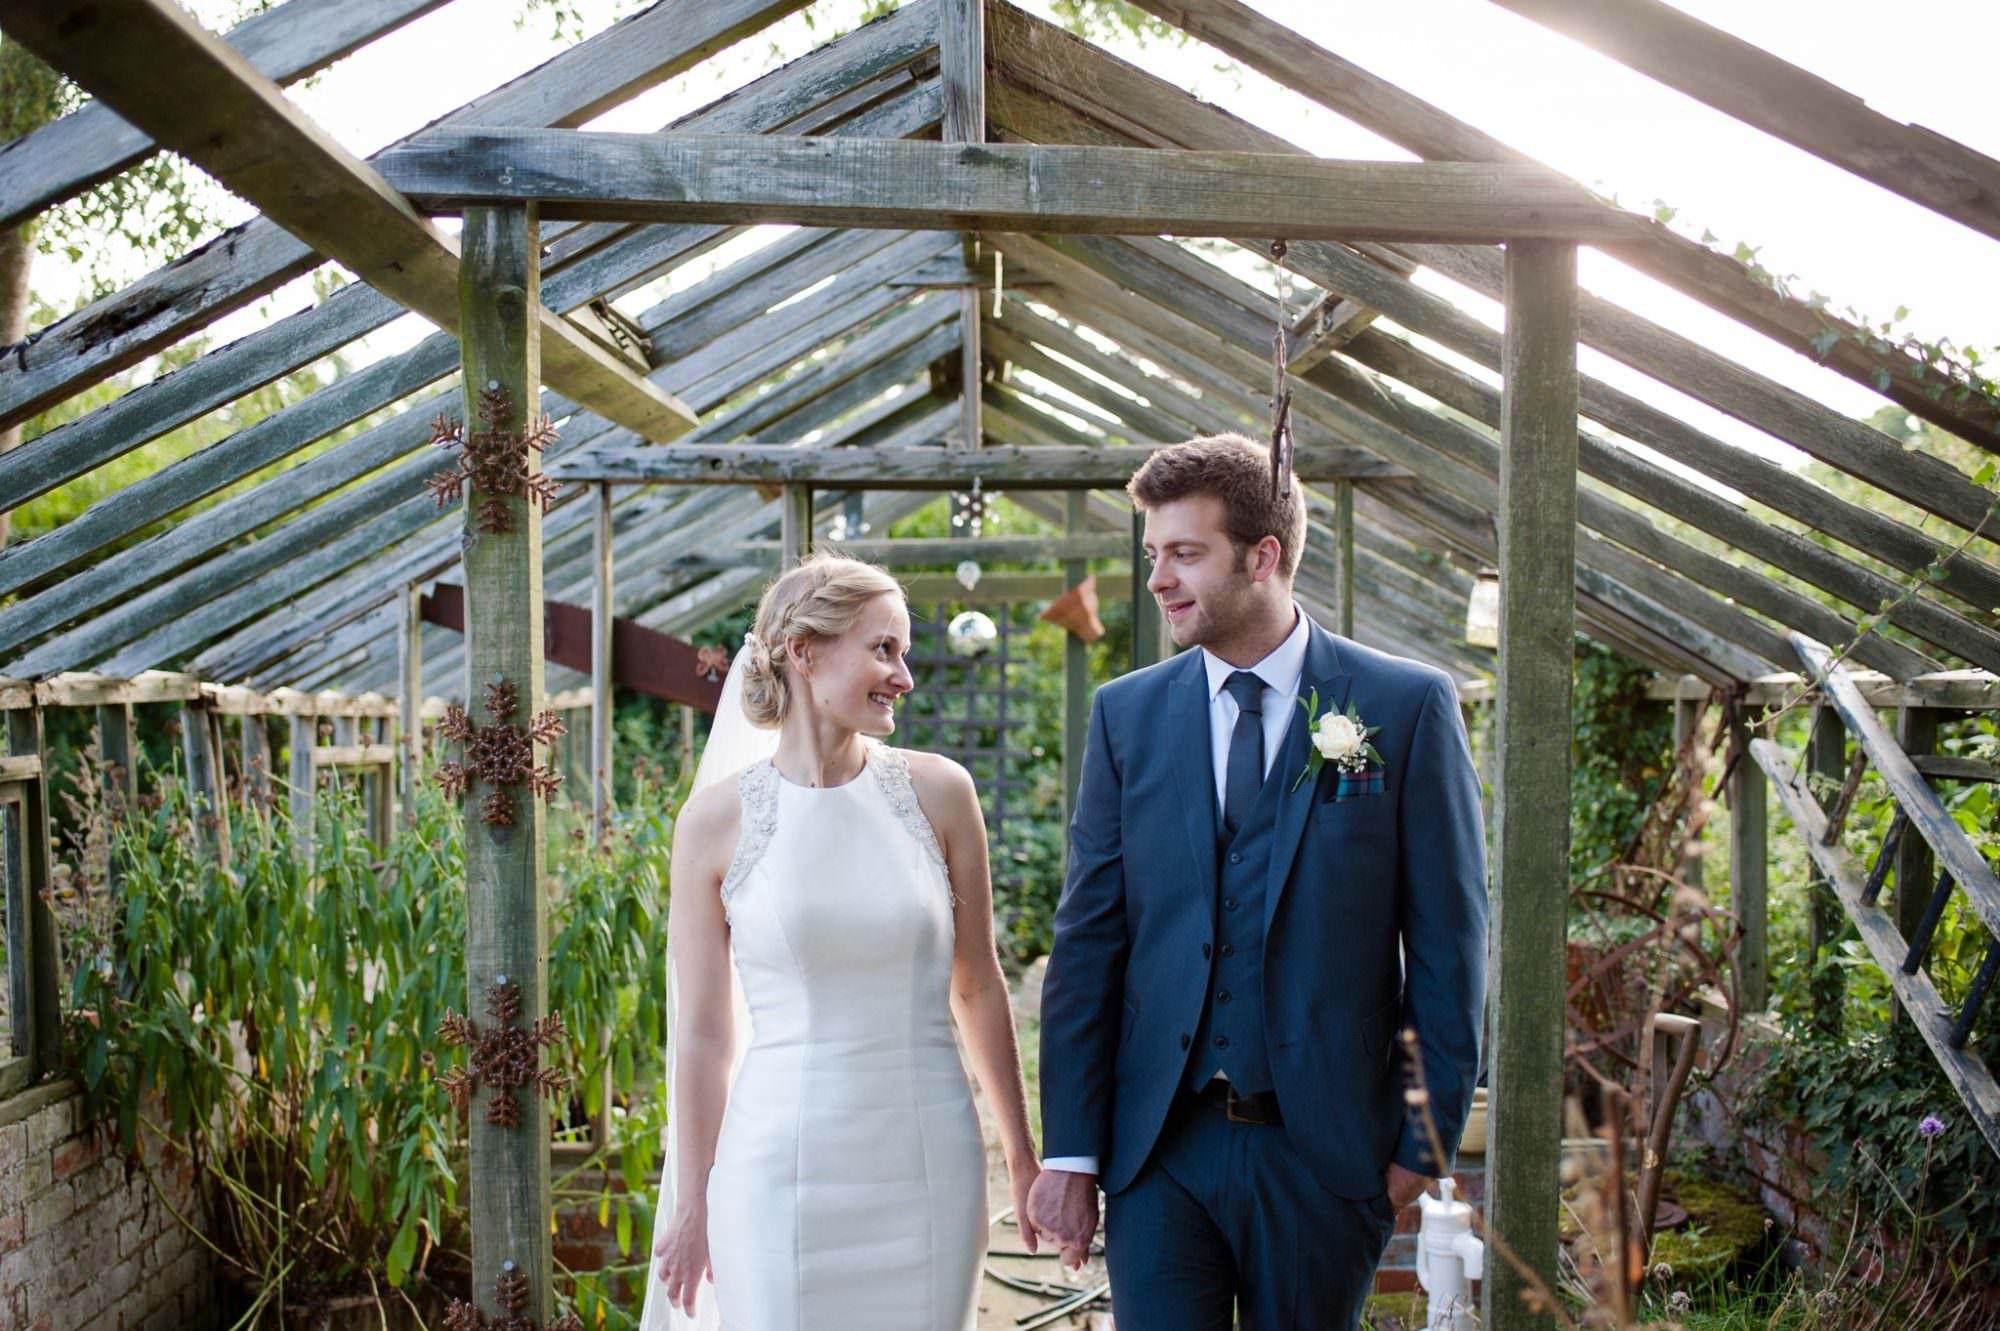 Wedding Photography at The Gordleton Mill Lymington